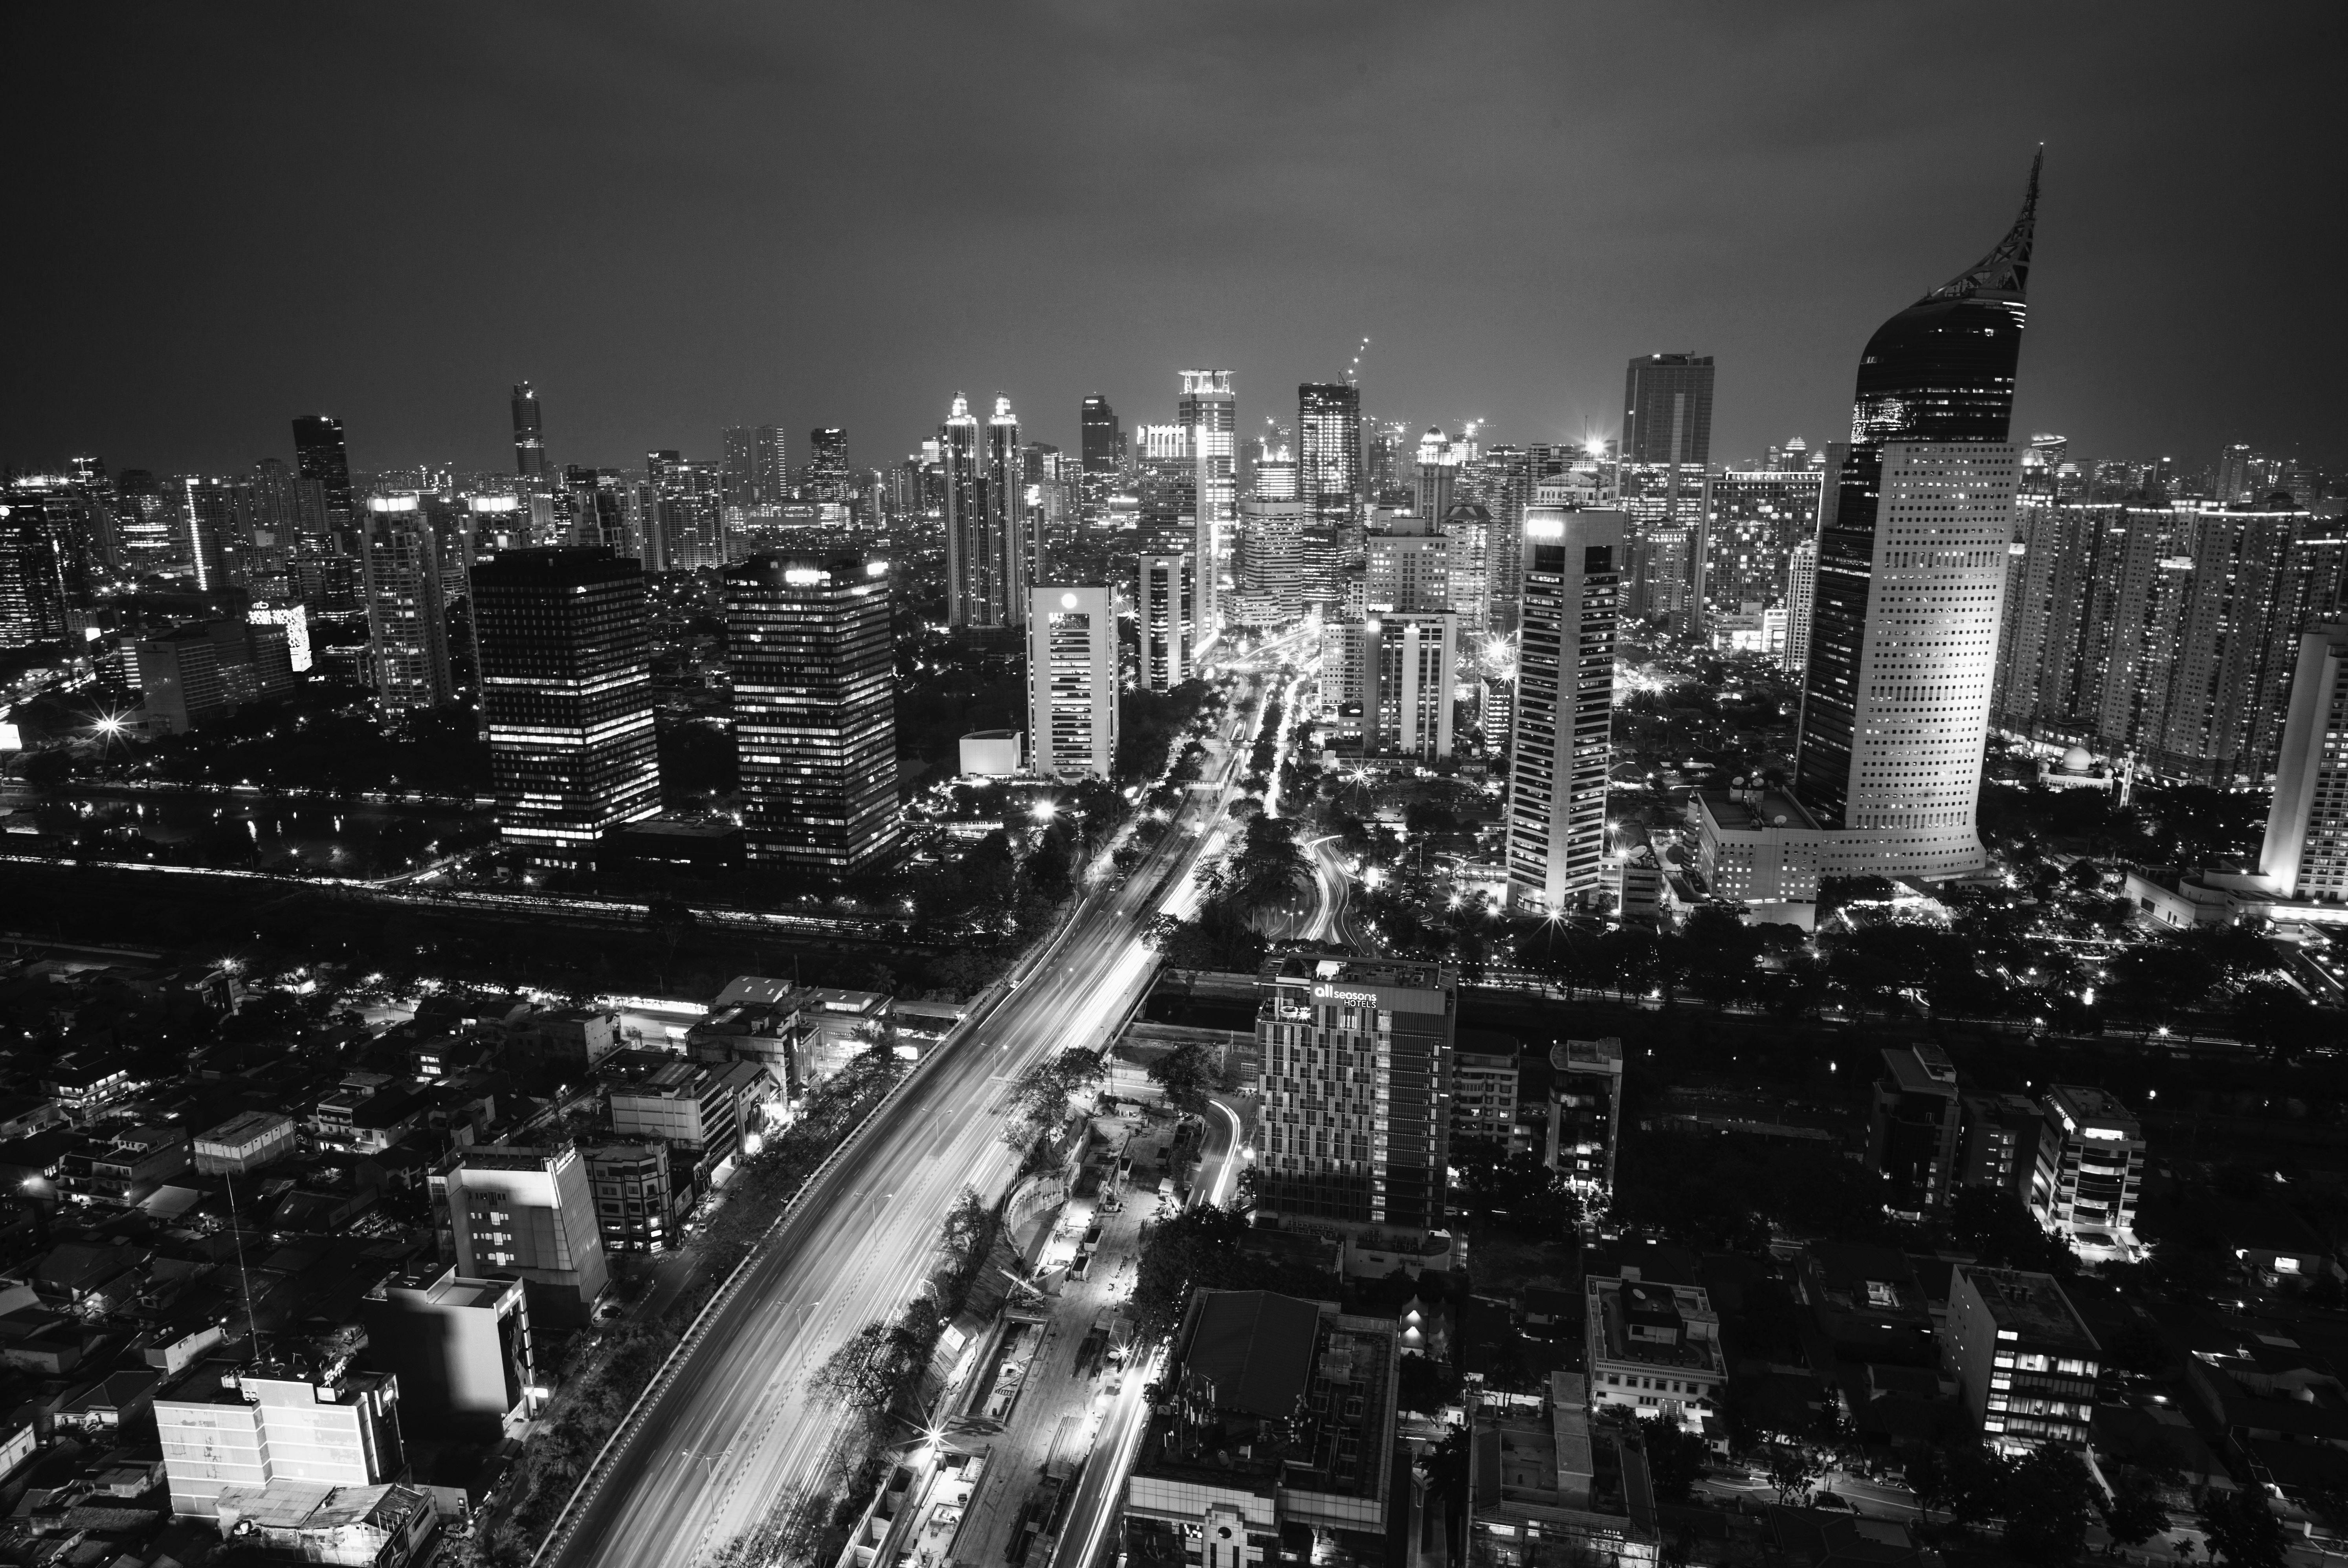 Auslandspraktikum in Jakarta: Vulkane, Street Food und Rooftop Bars